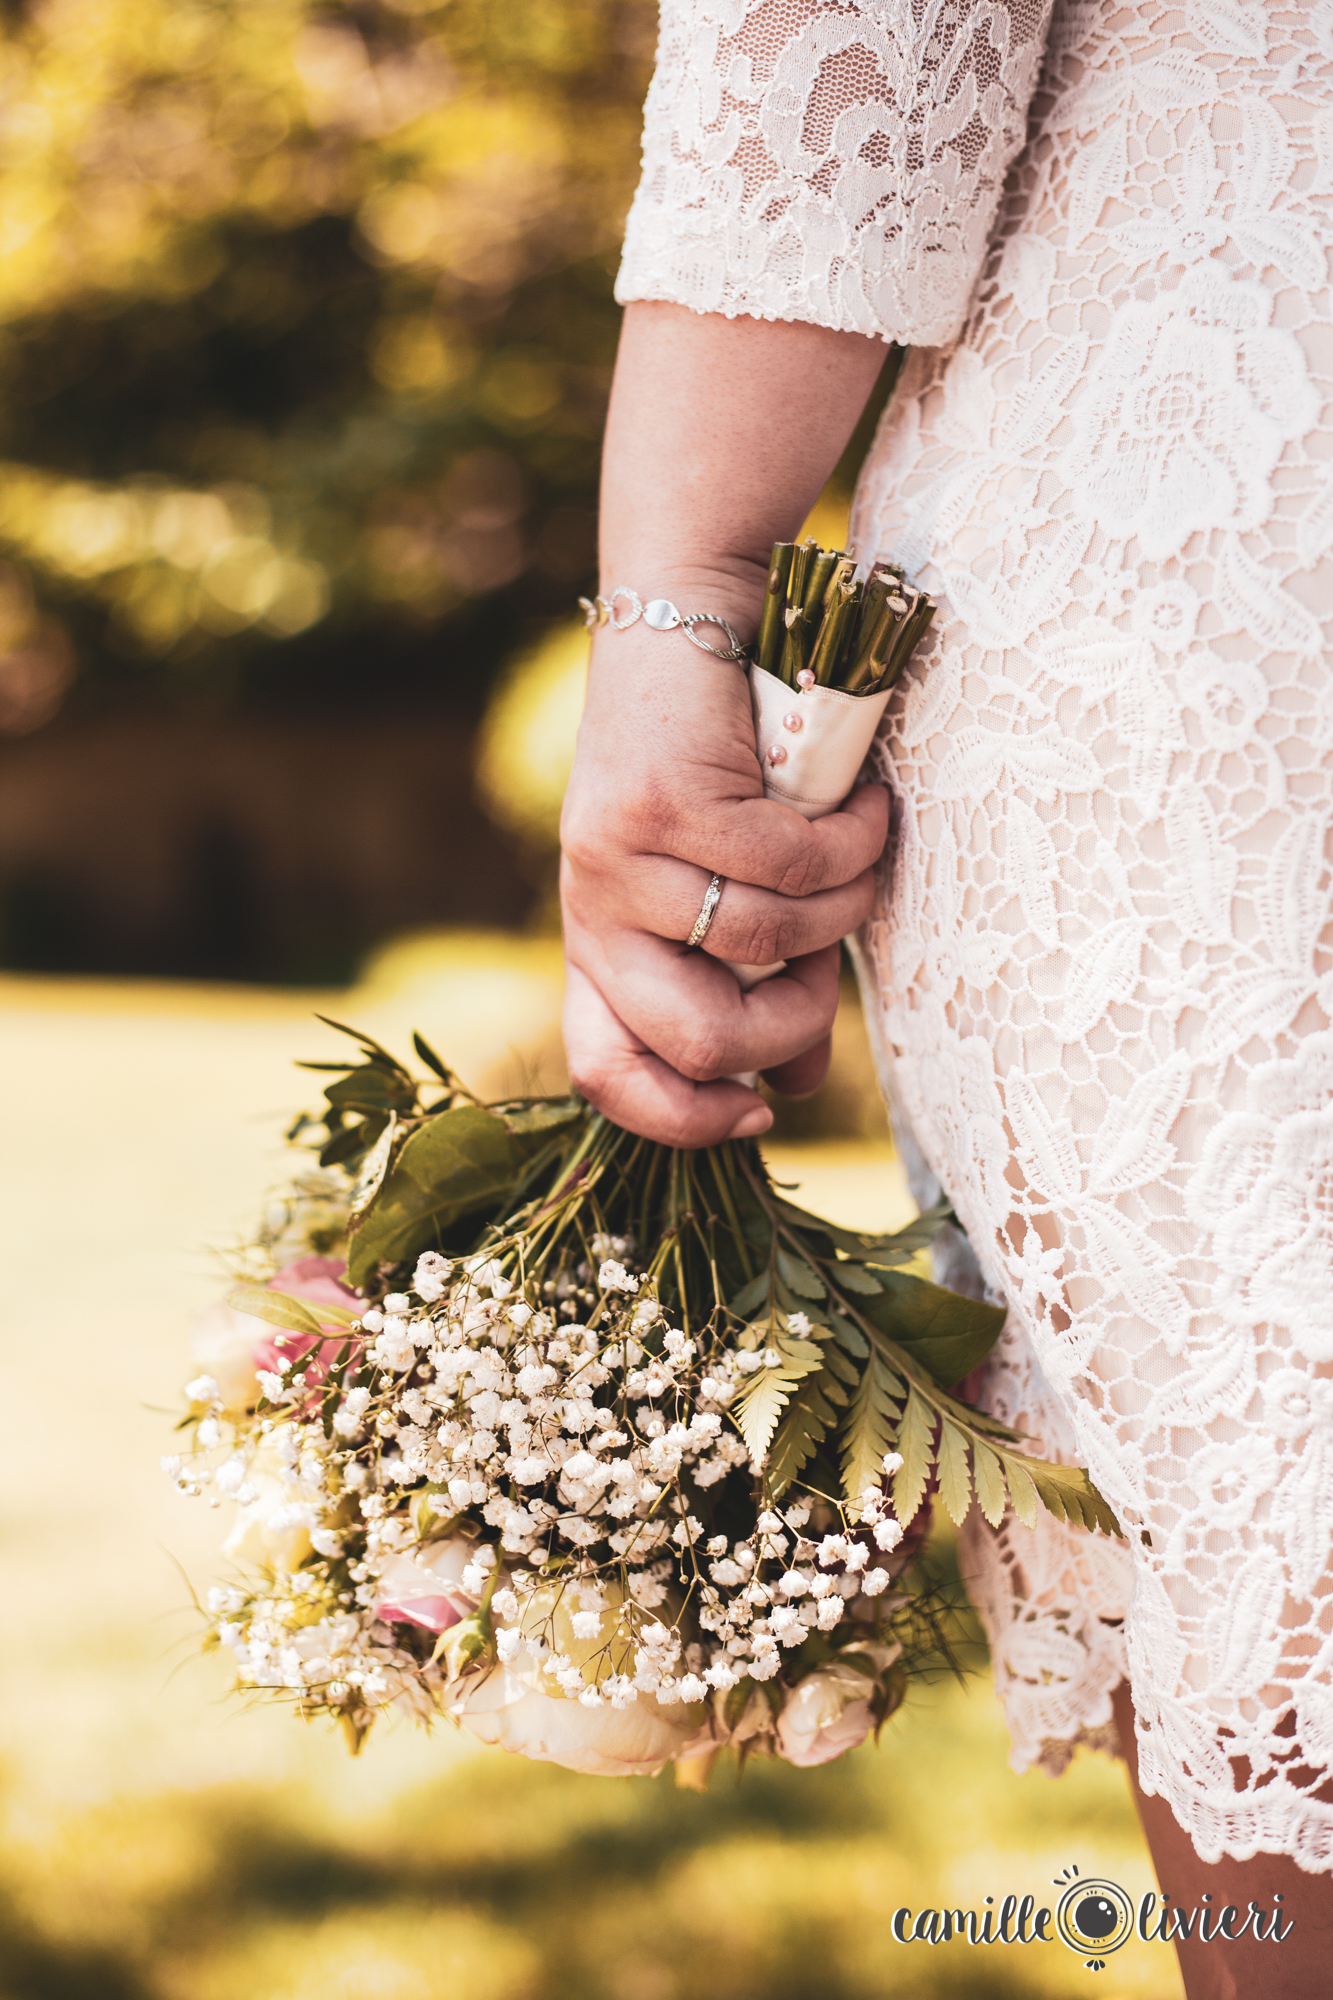 photographe_grenoble_mariage-camille-olivieri-64